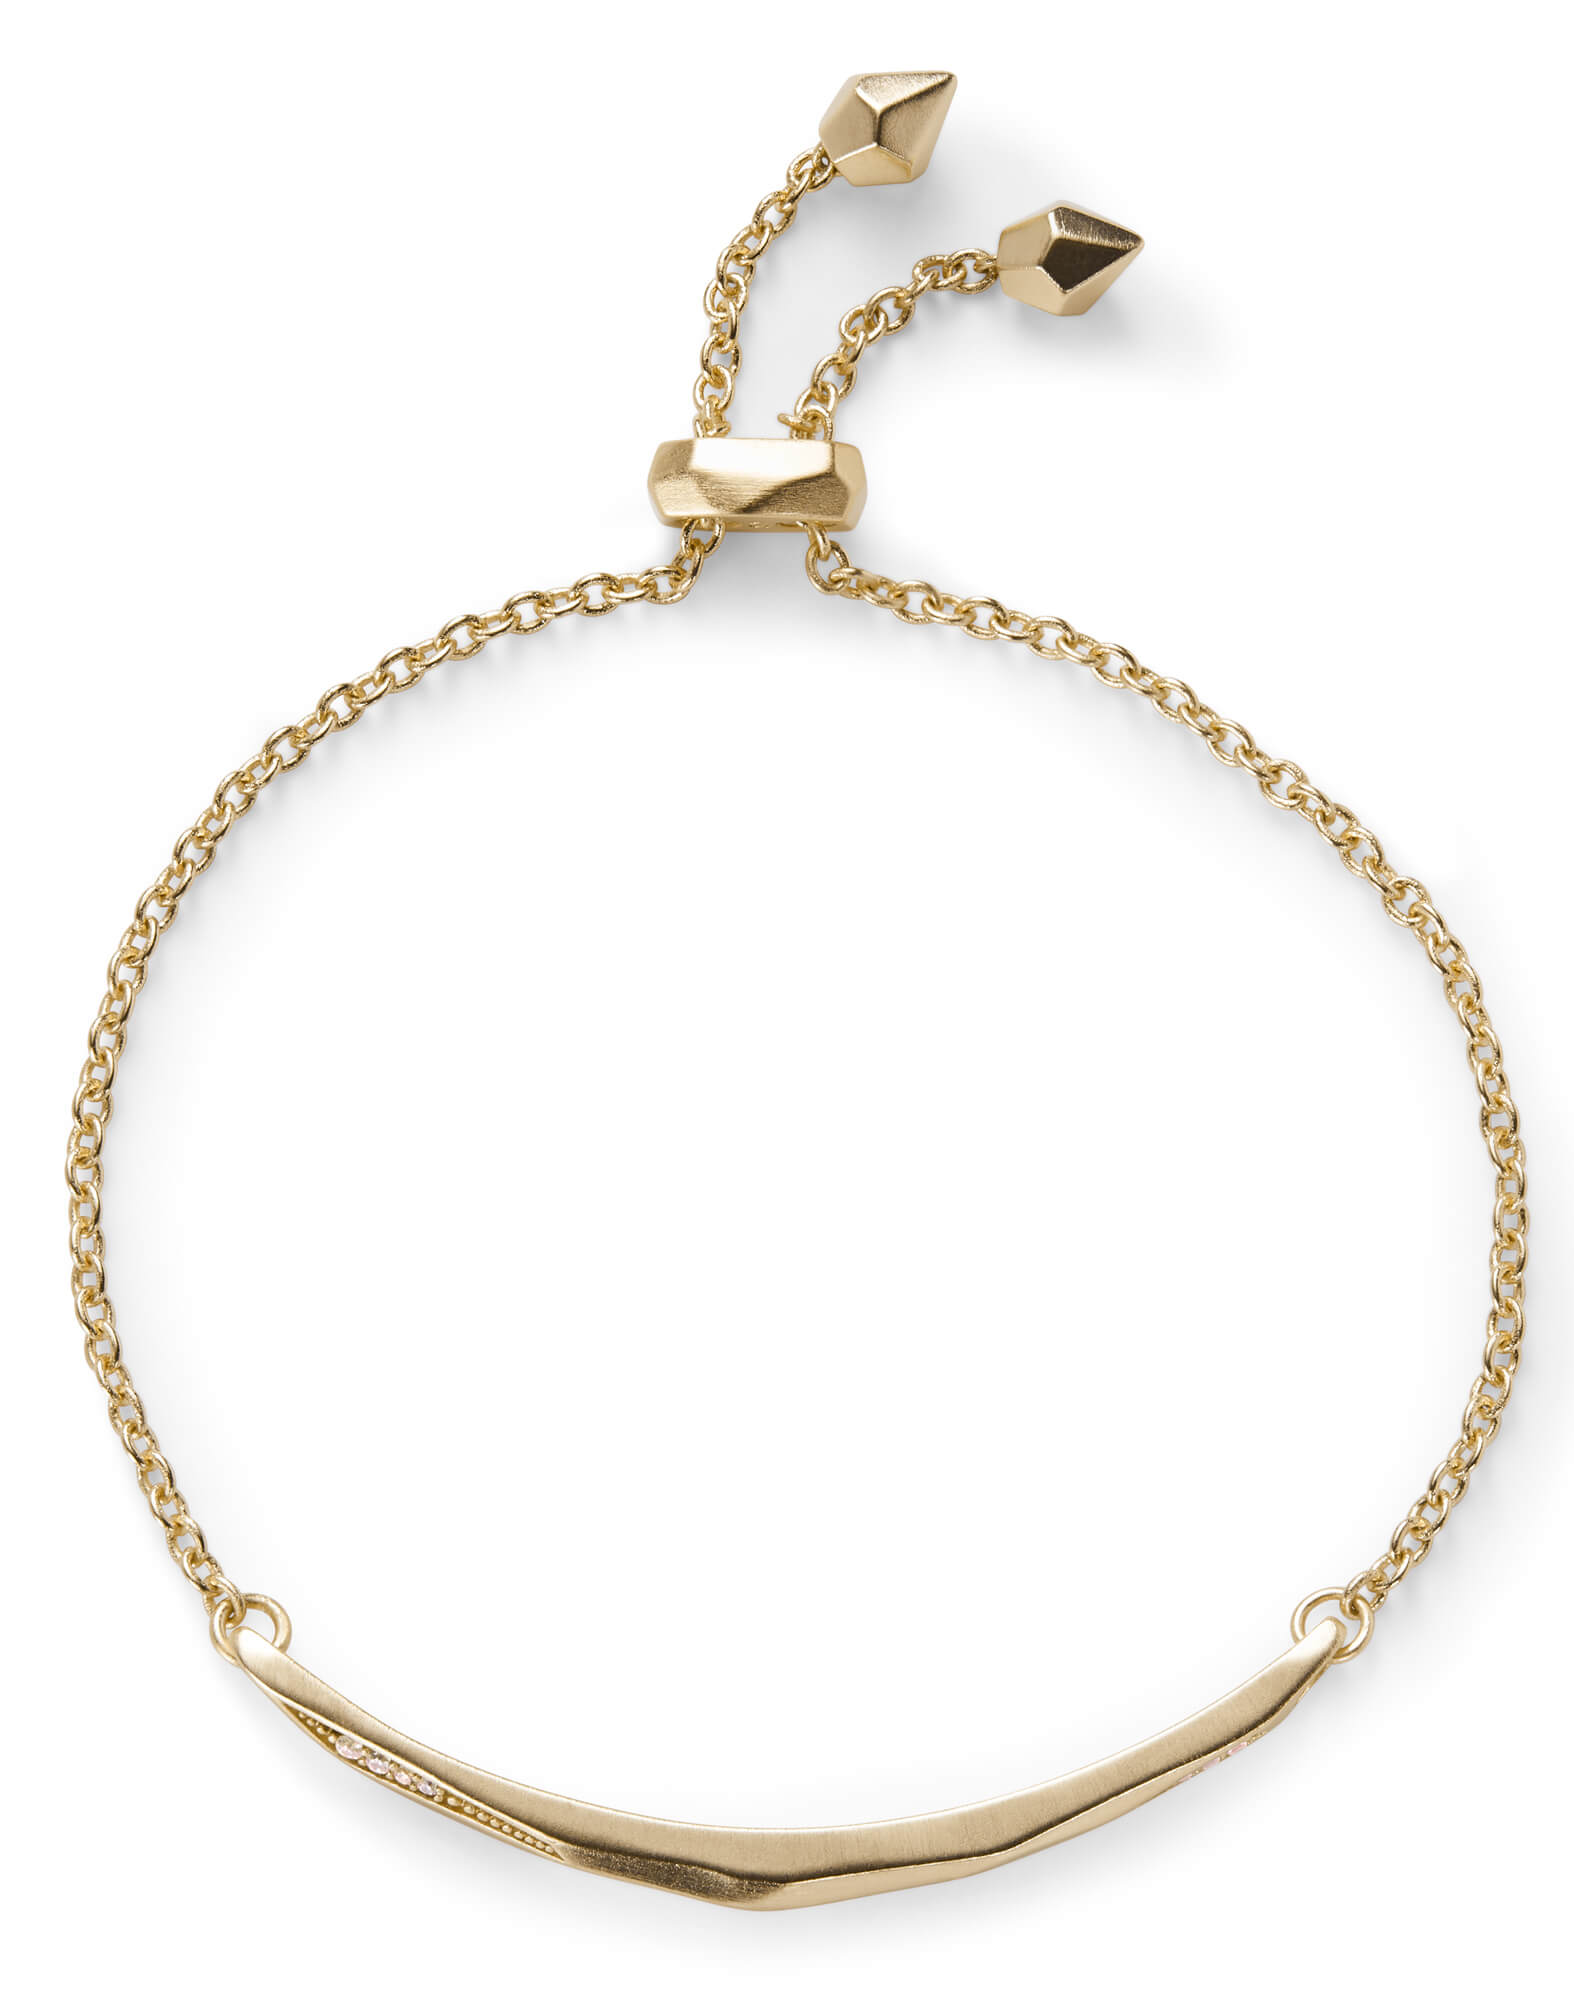 Angela Adjule Chain Bracelet In Gold